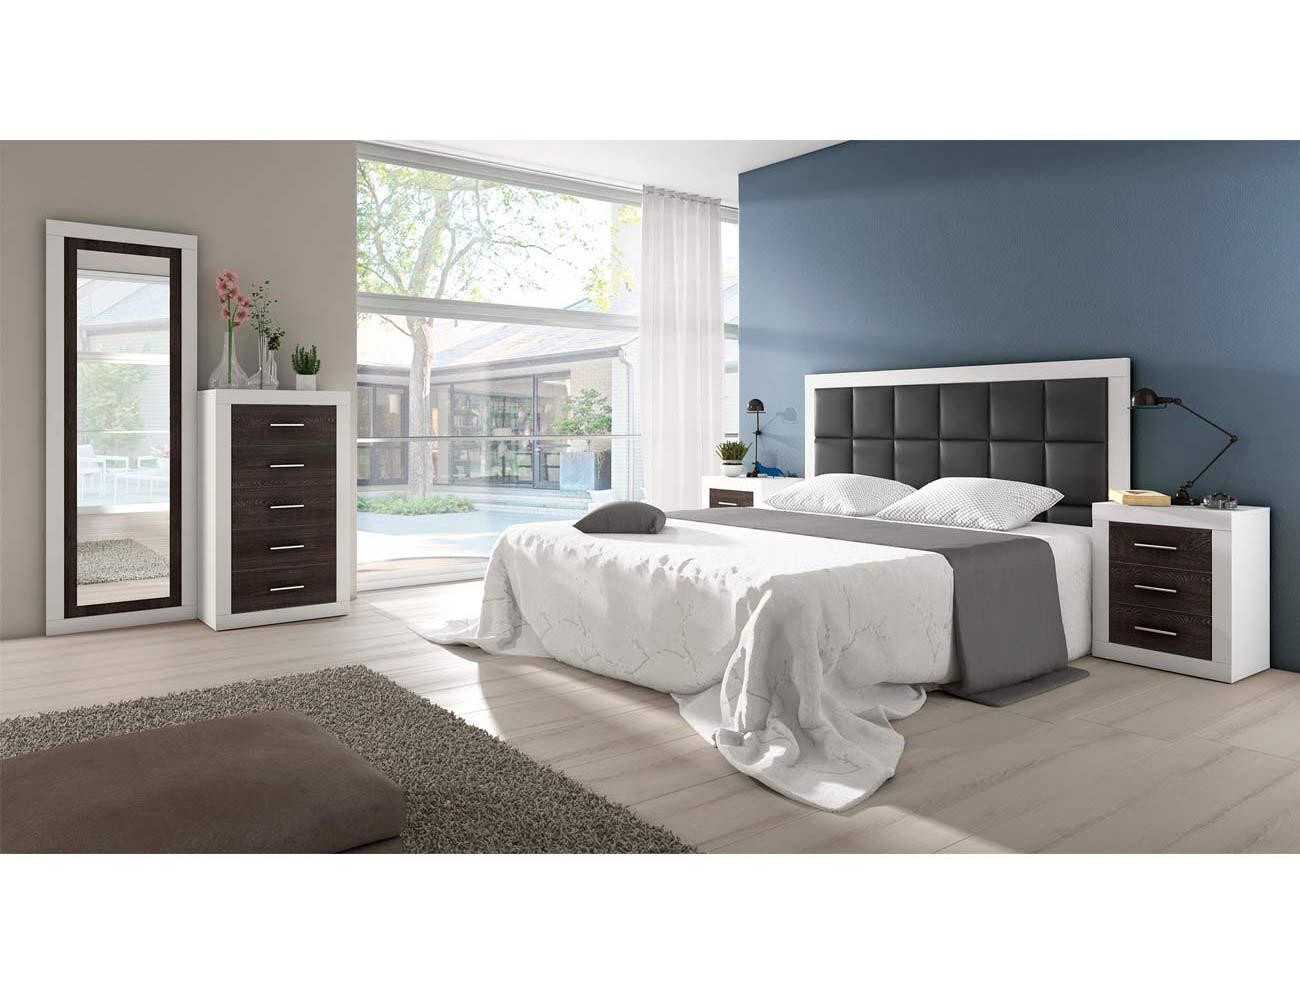 06 dormitorio matrimonio polipiel blanco grafito1